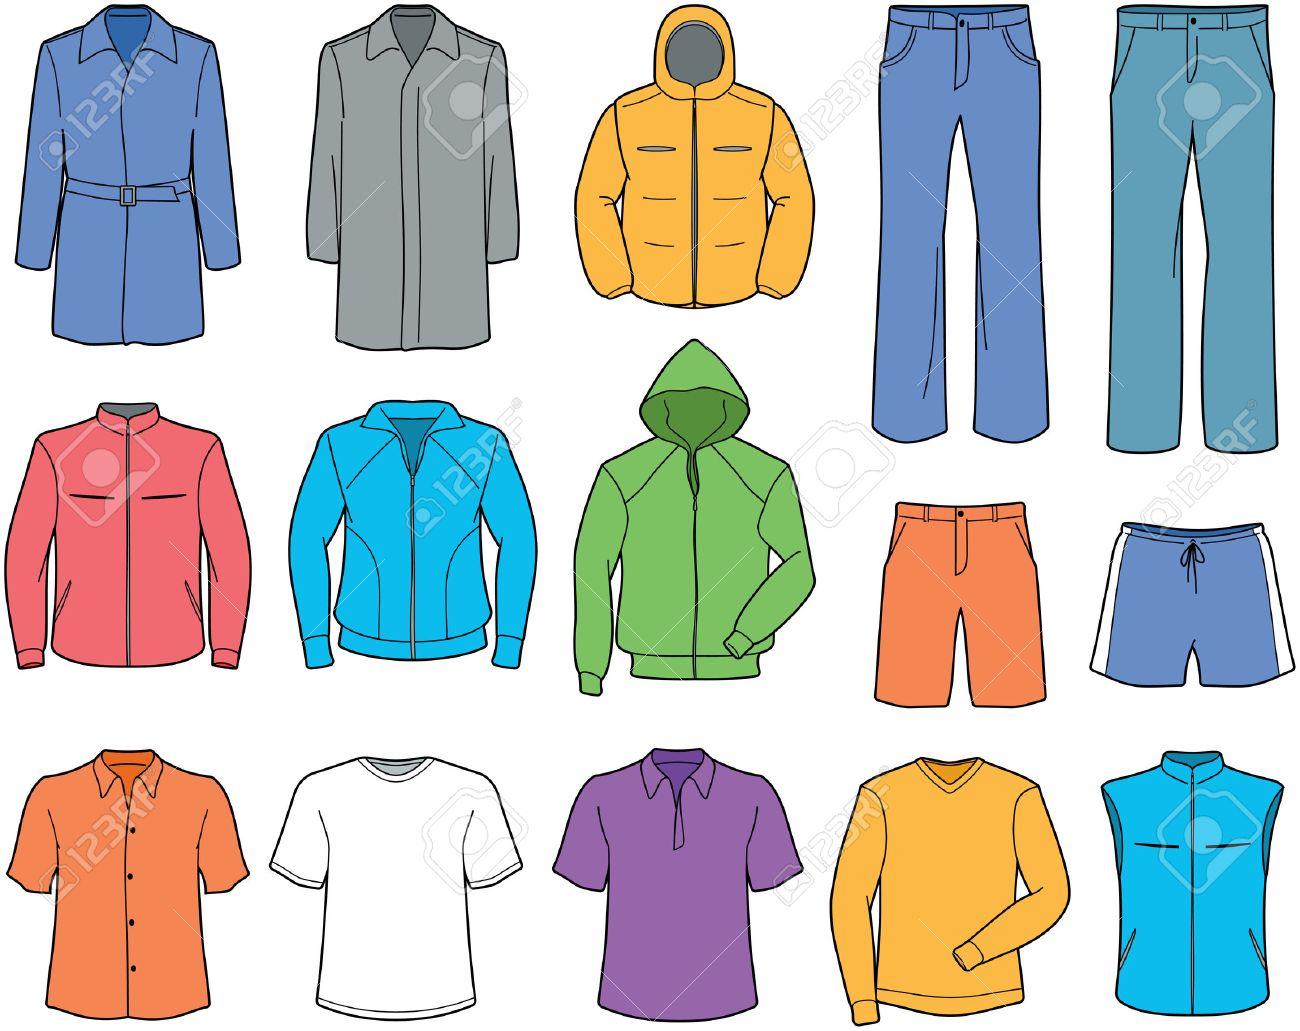 Men Casual Clothes And Sportswear Illust-Men casual clothes and sportswear illustration Stock Vector - 7309606-2